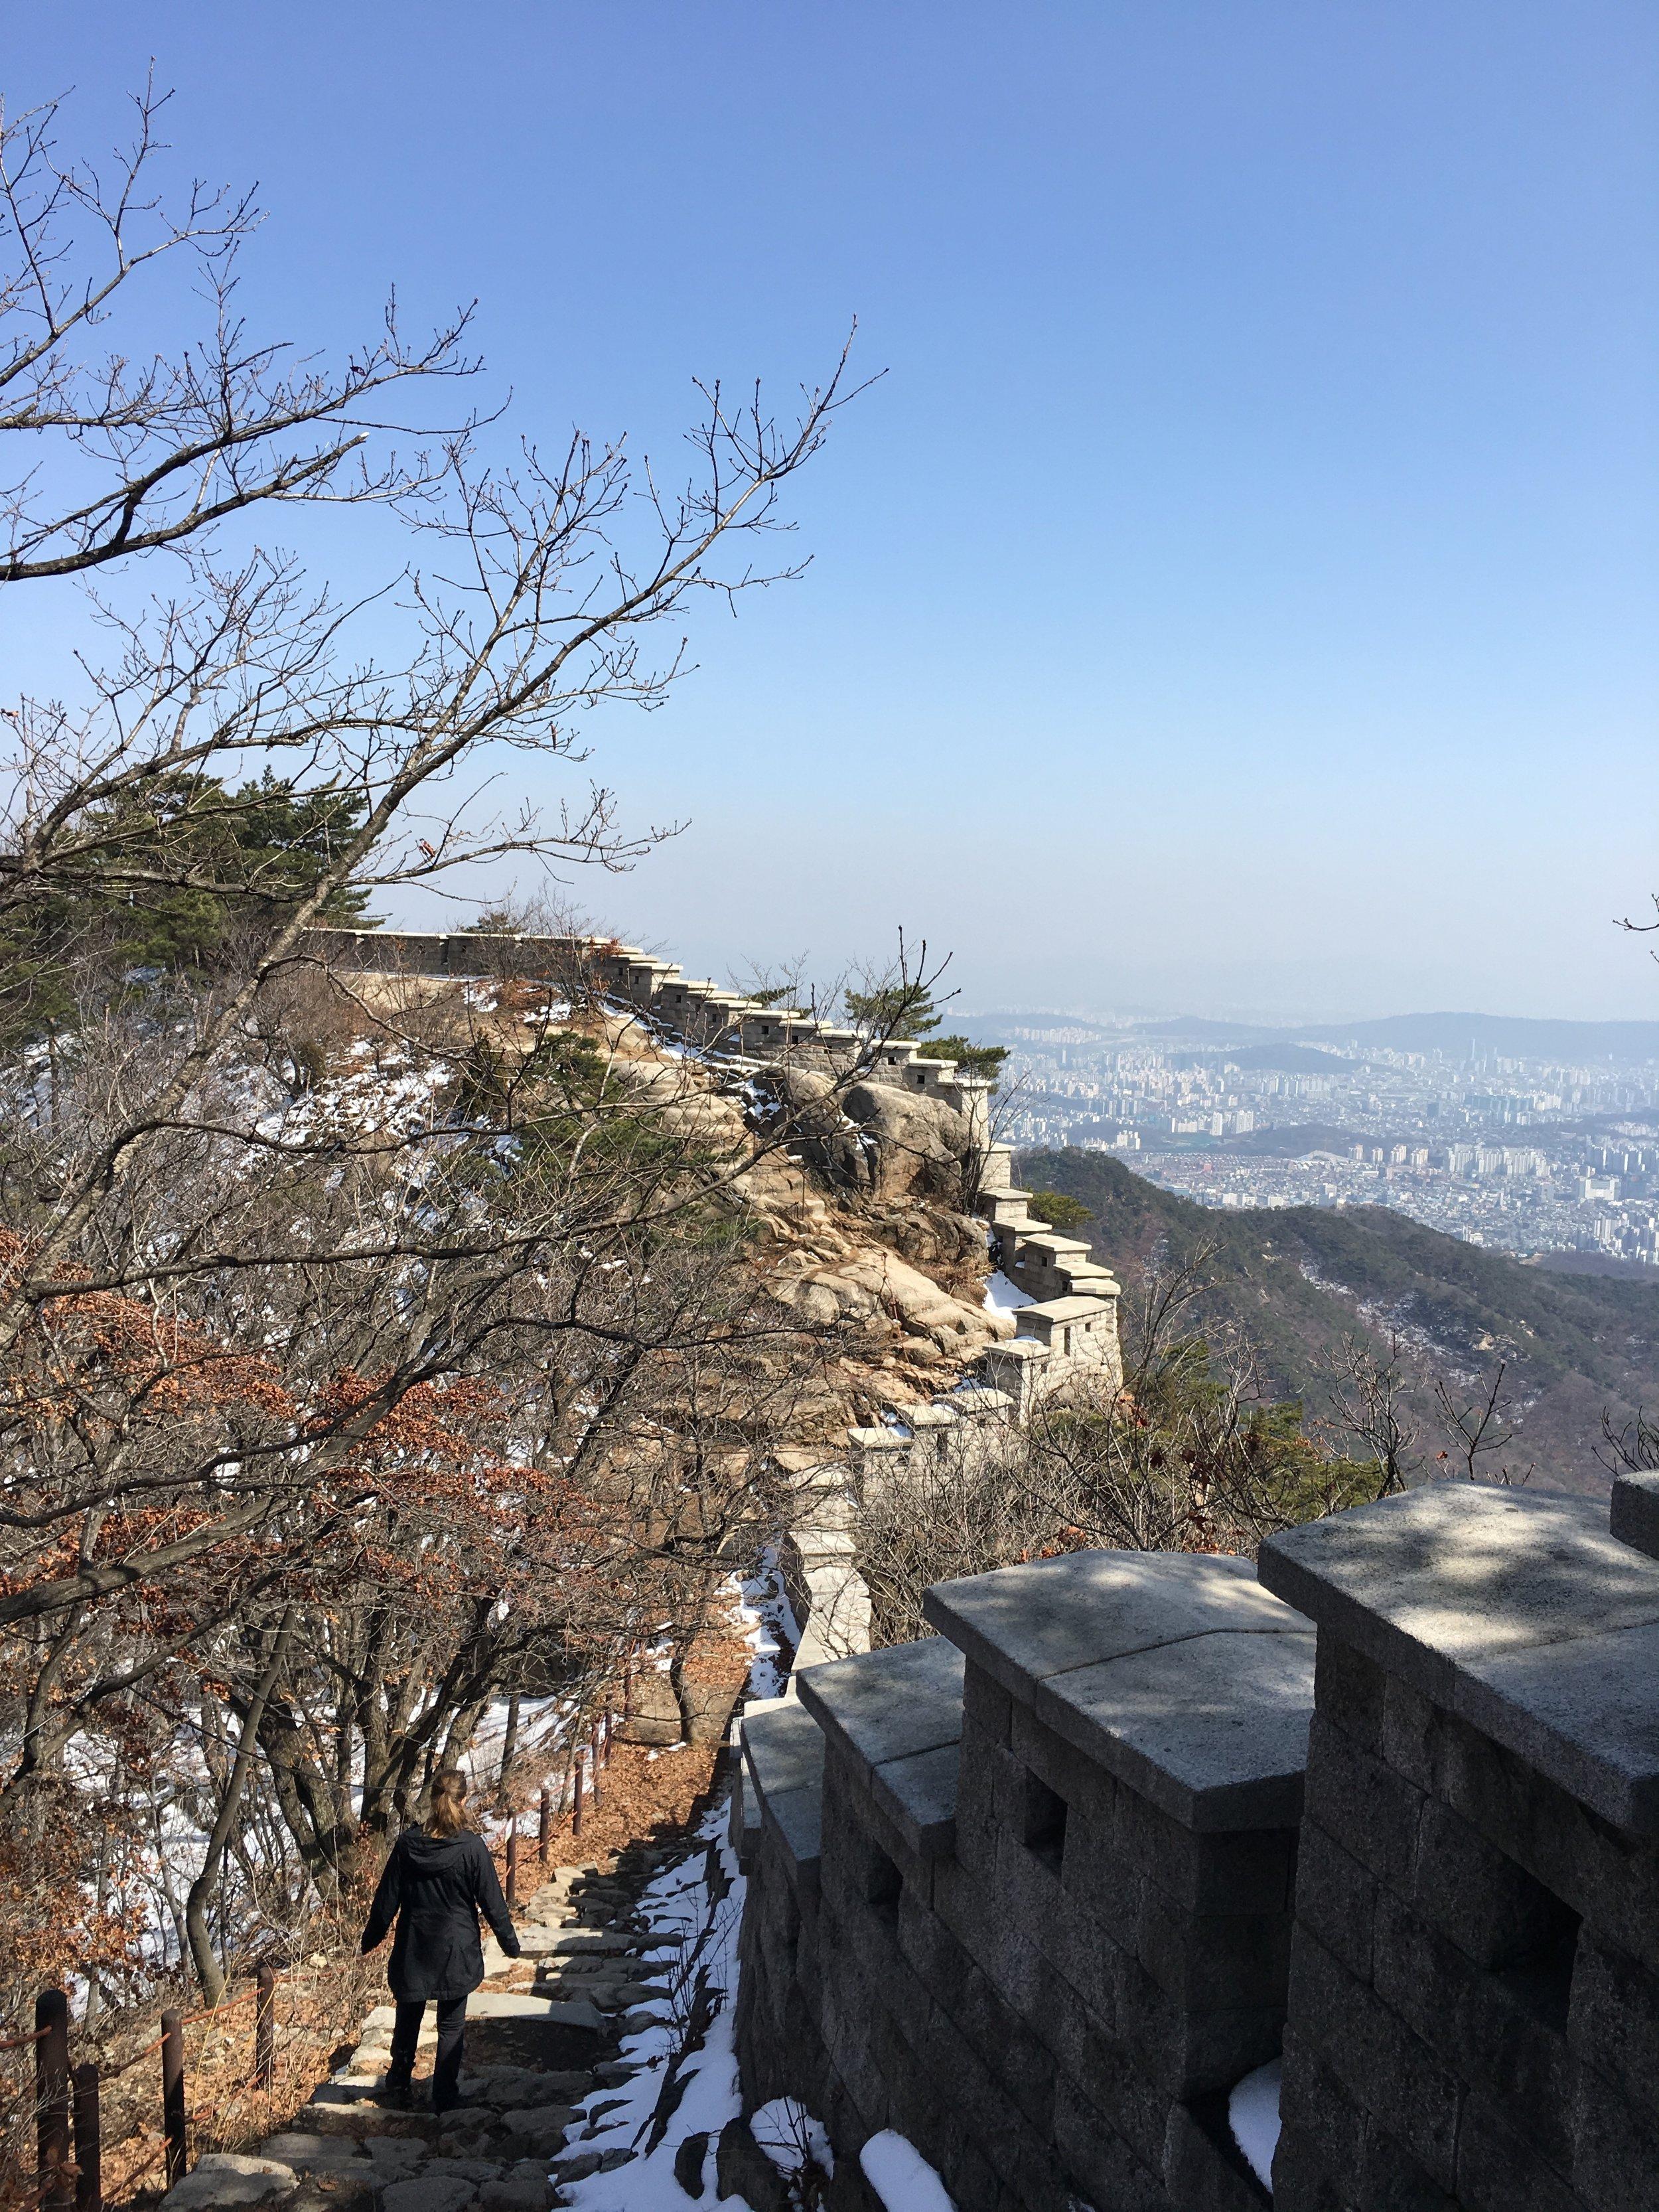 Walking the Fortress wall bukhansan national park seoul korea